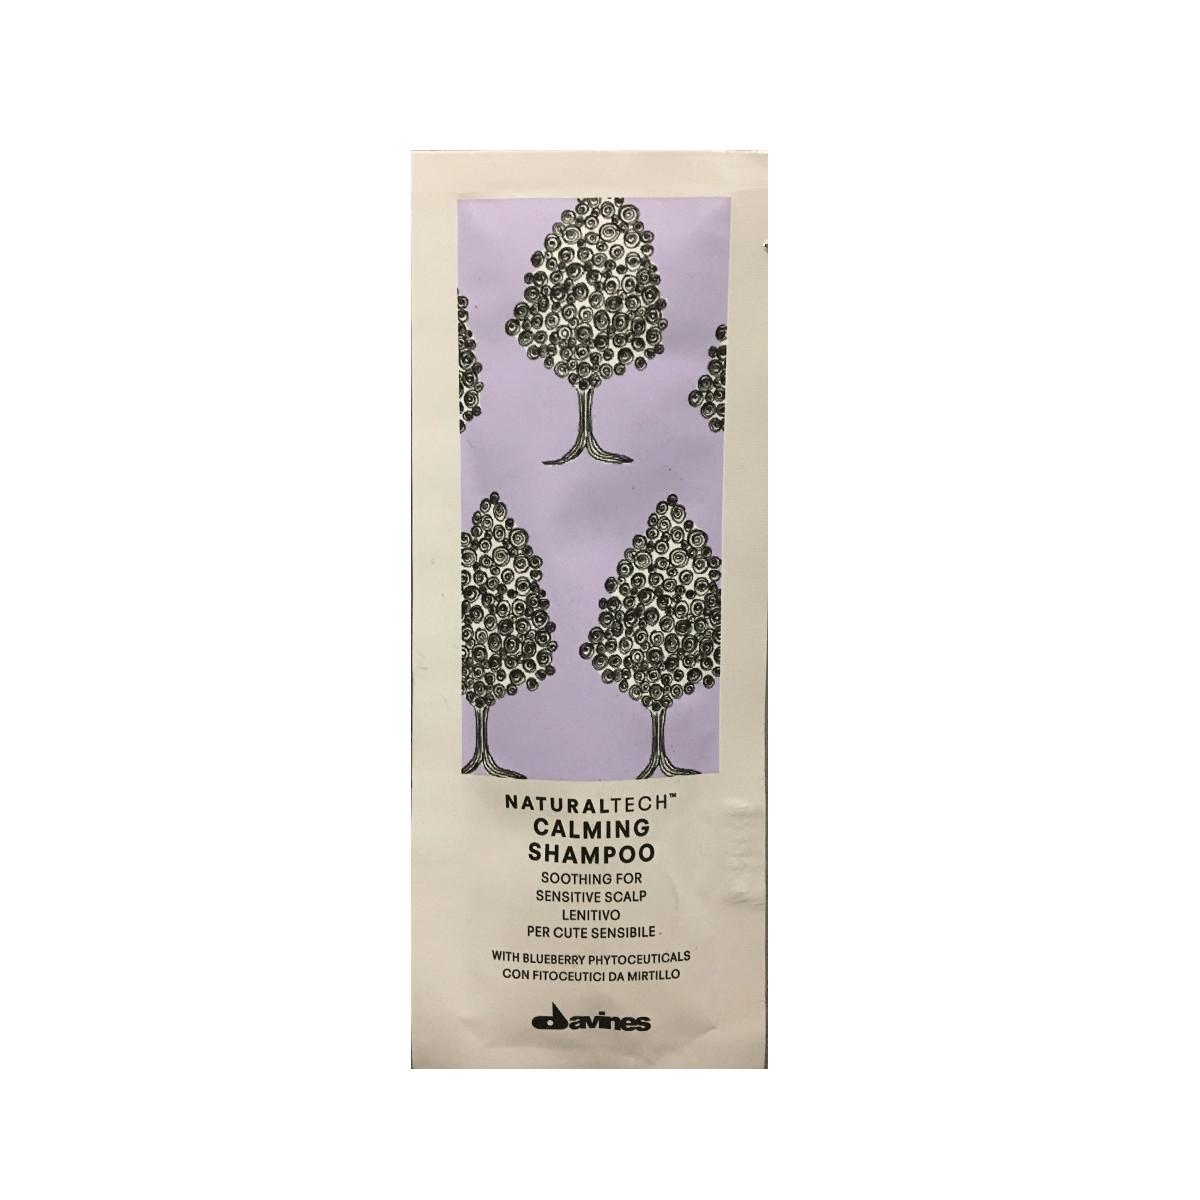 Davines Calming Shampoo Muestra 12 ml | Cuero Cabelludo Sensible